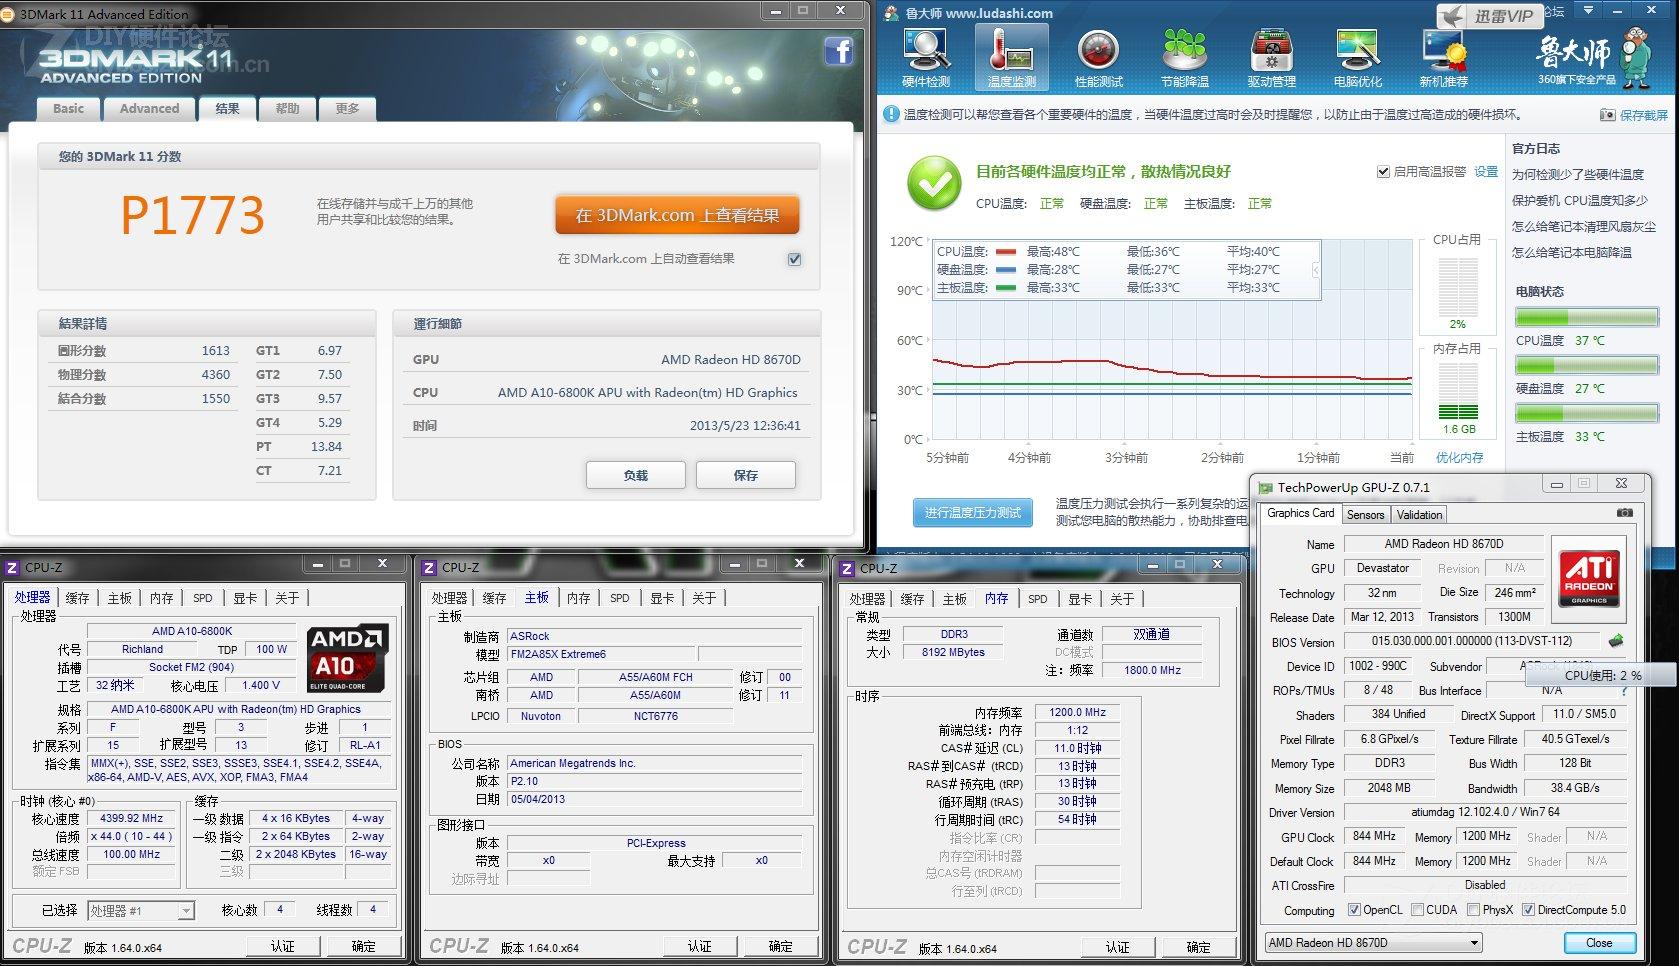 A10-6800K: 3DMark 11 Performance